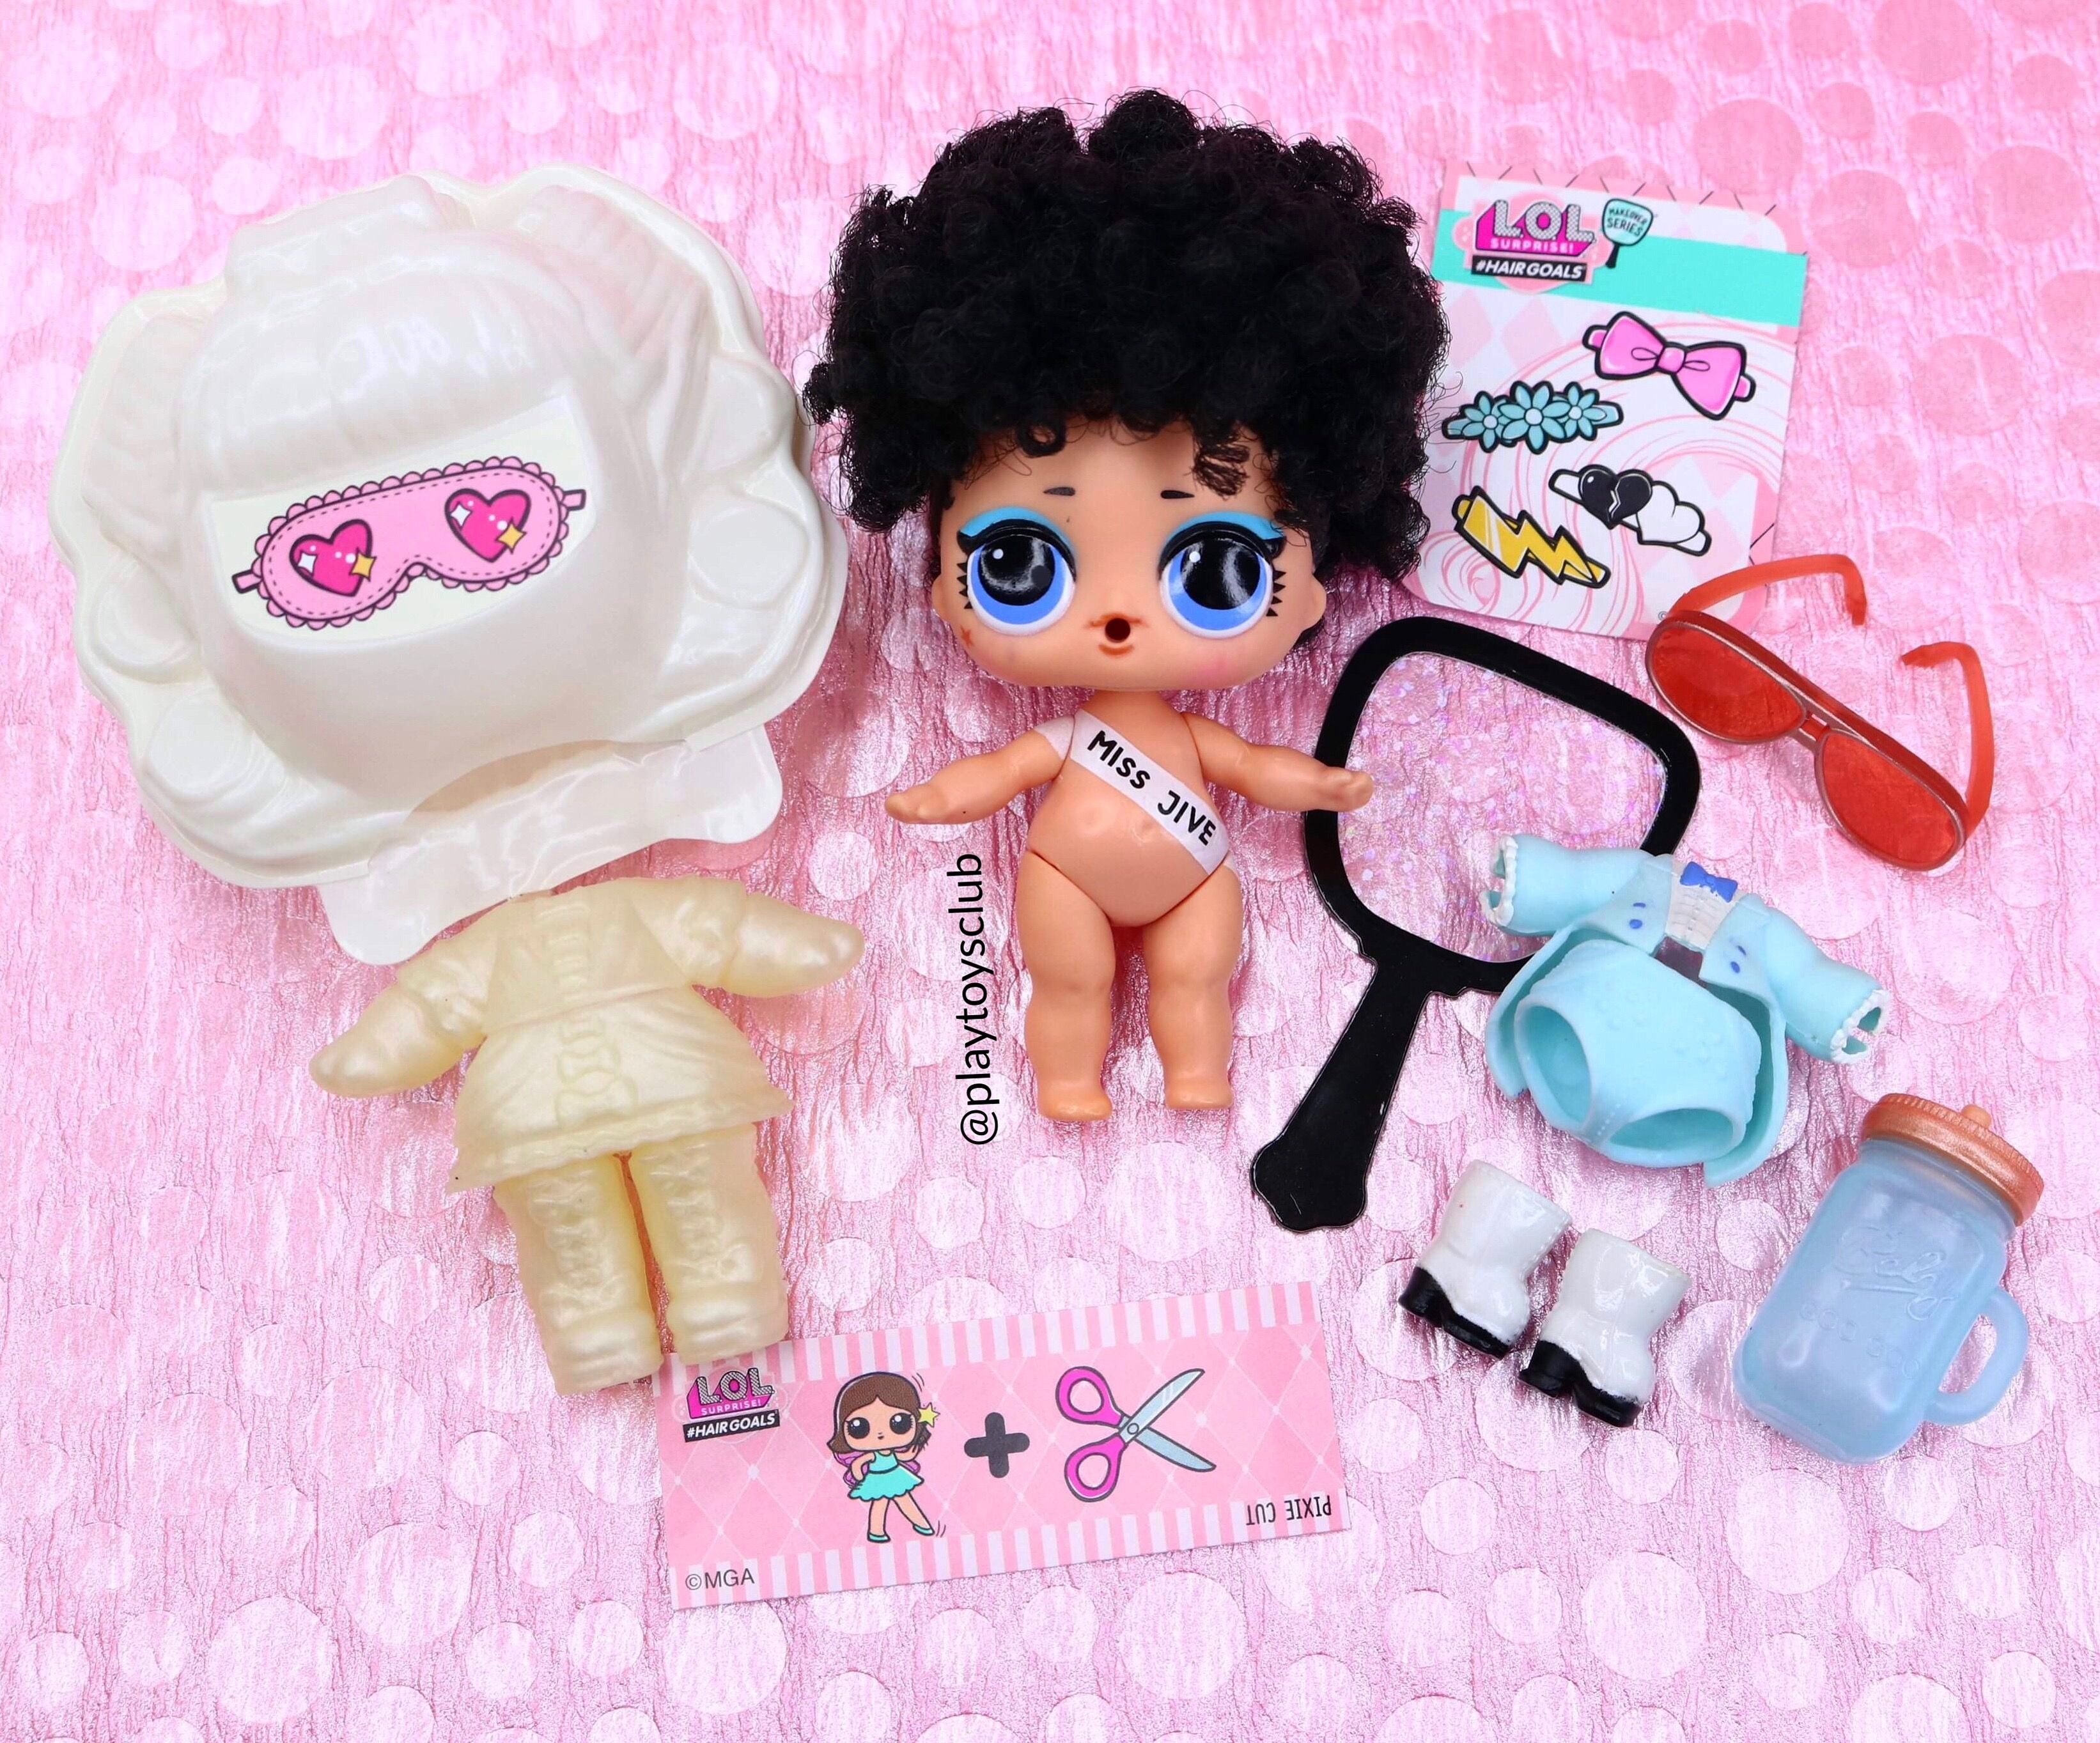 Surprise L.o.l •hairgoals • Makeover • Daring Diva • ?-027 • Nuova ♥️???????????????